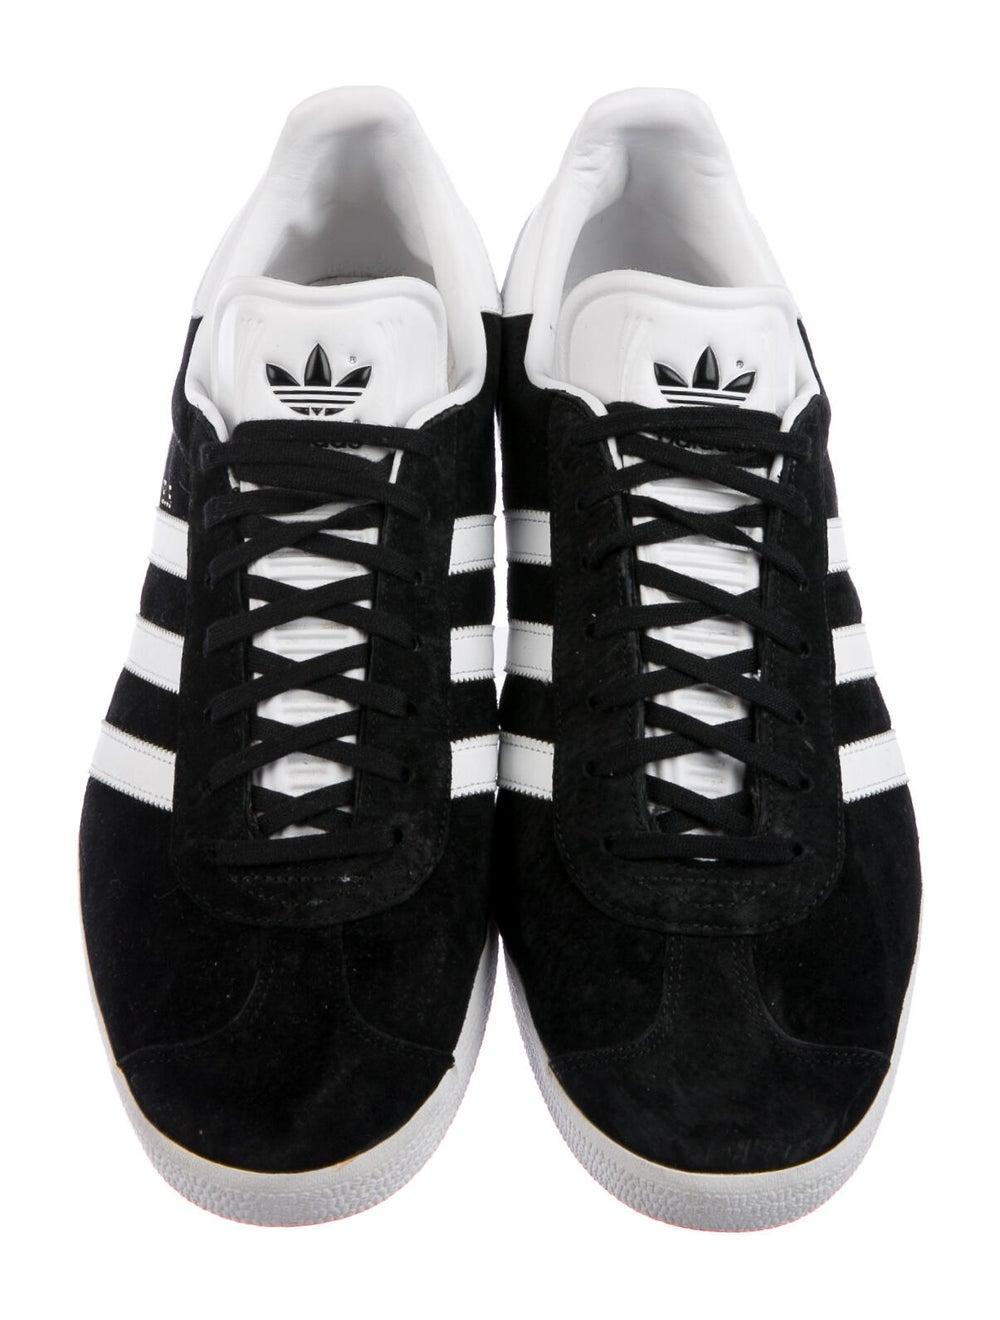 Adidas Gazelle Sneakers Black - image 3